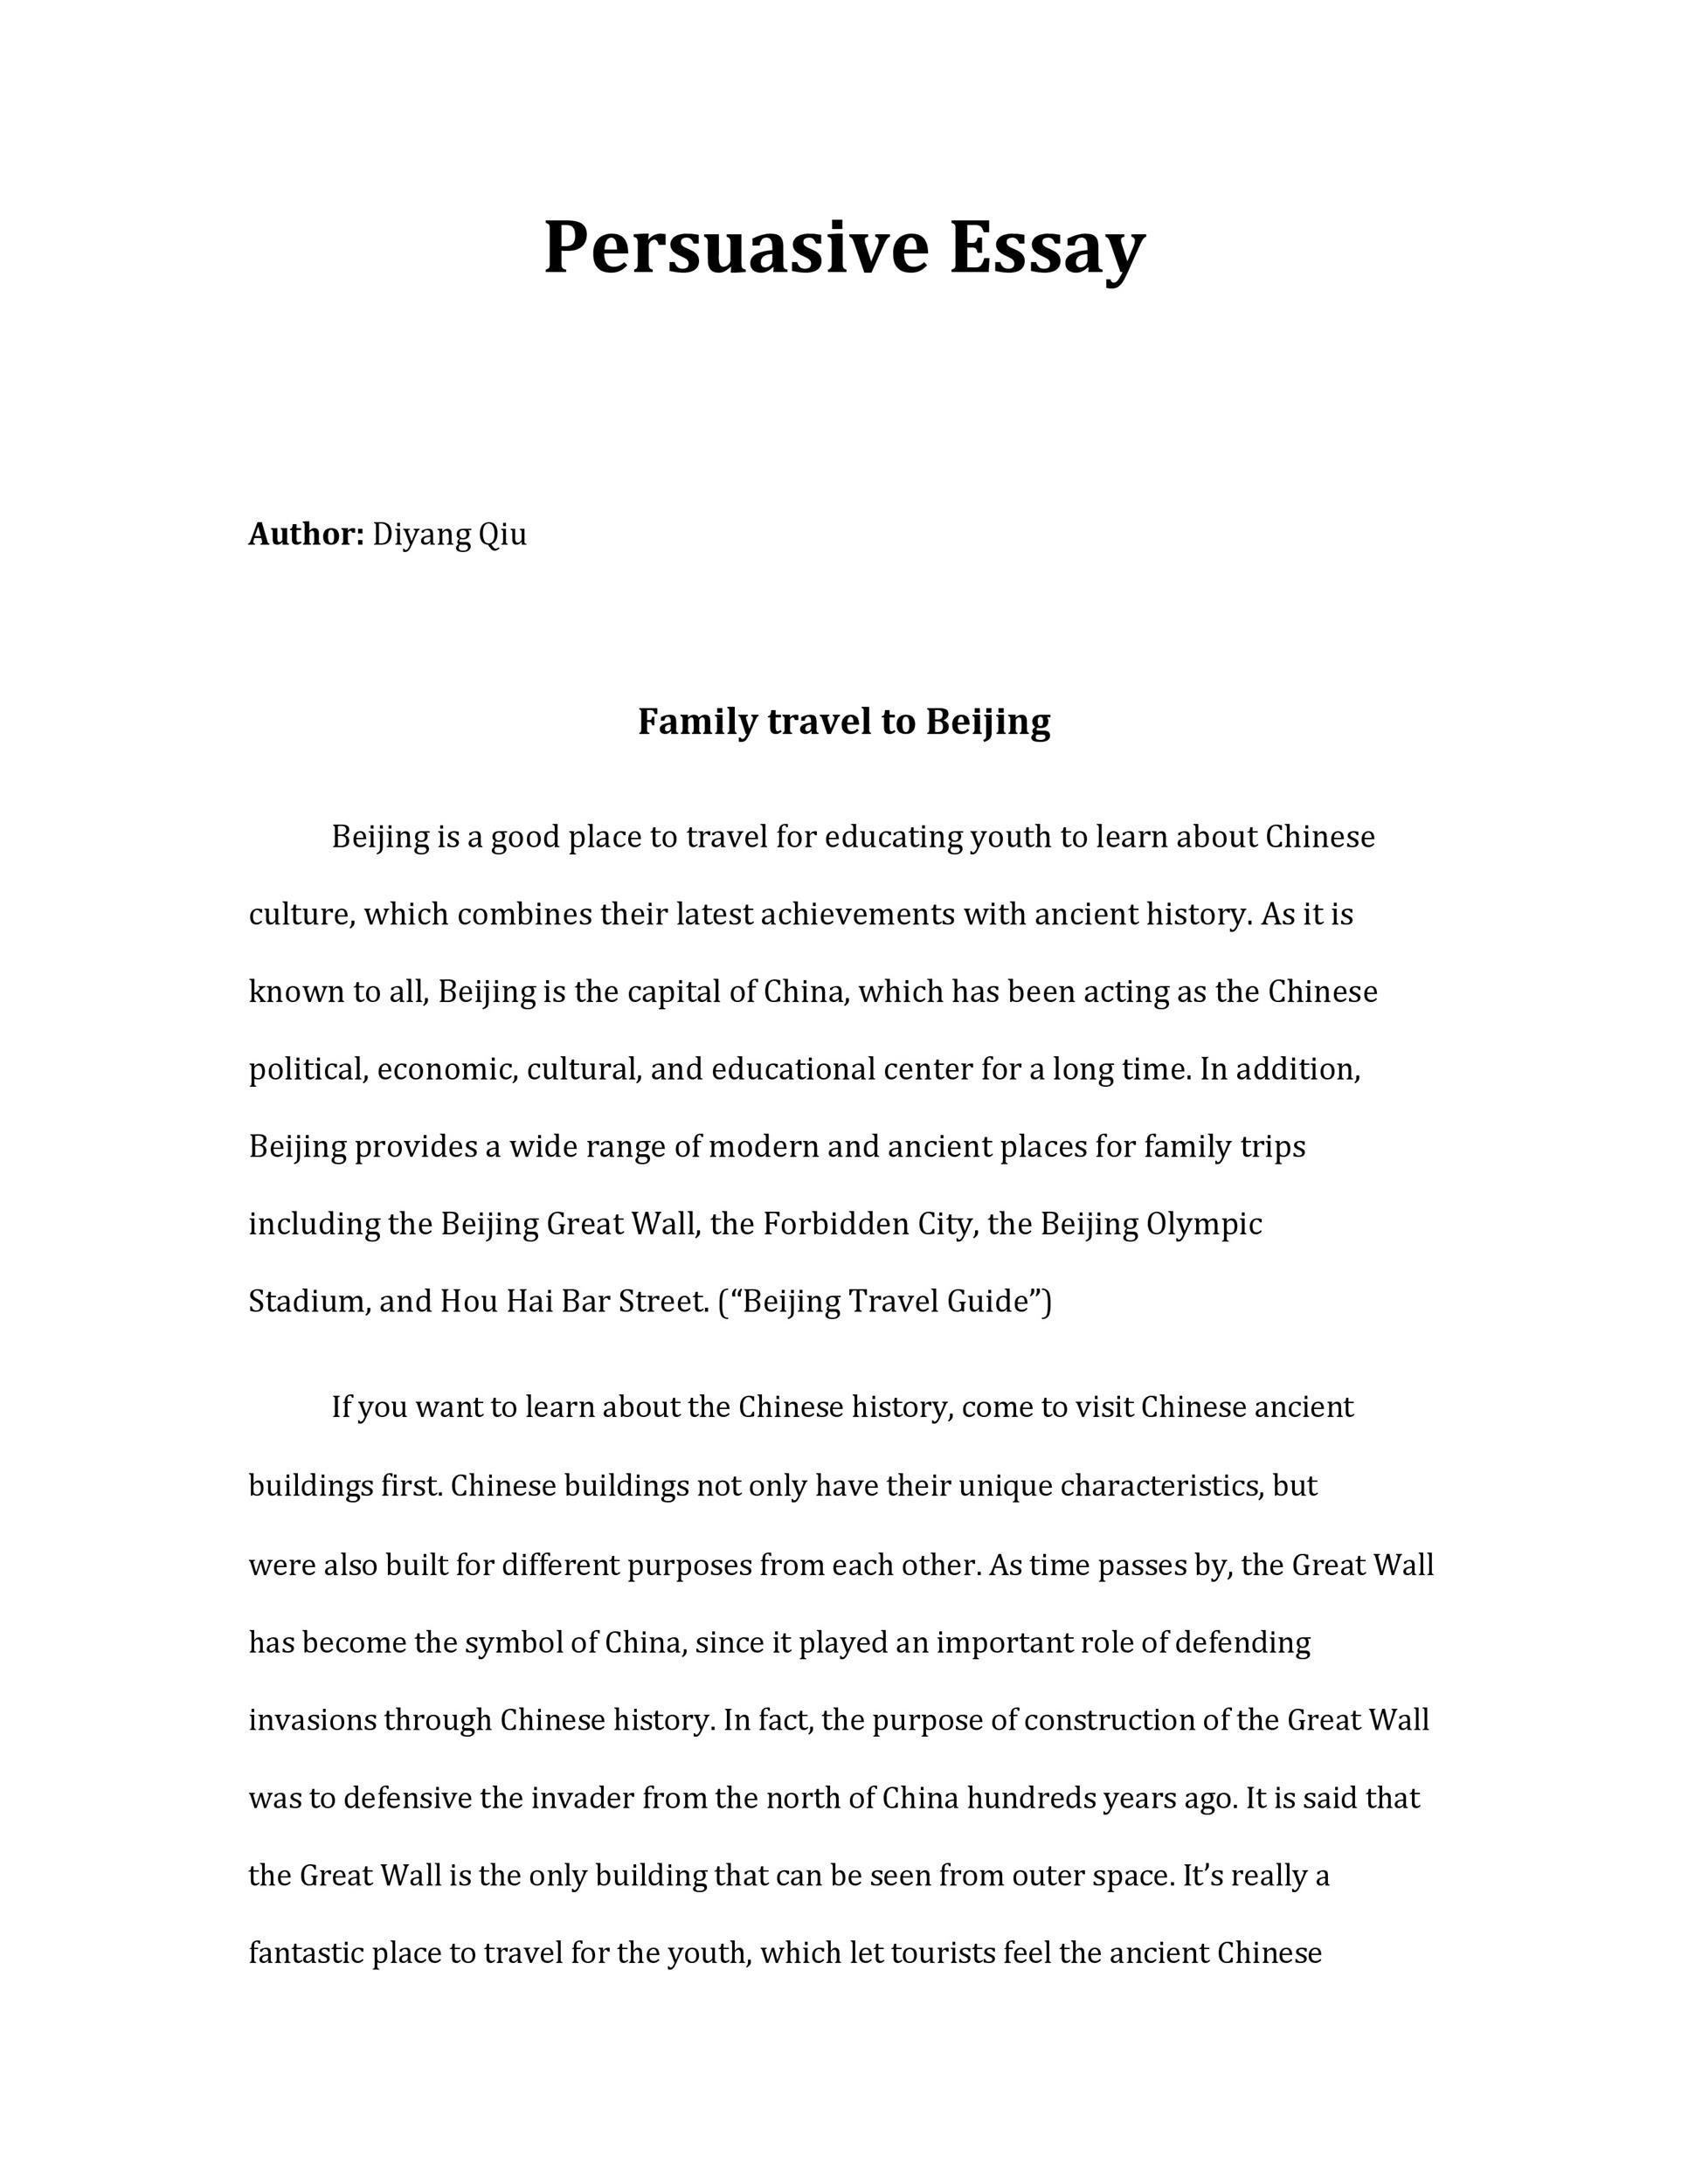 Free persuasive essay example 01